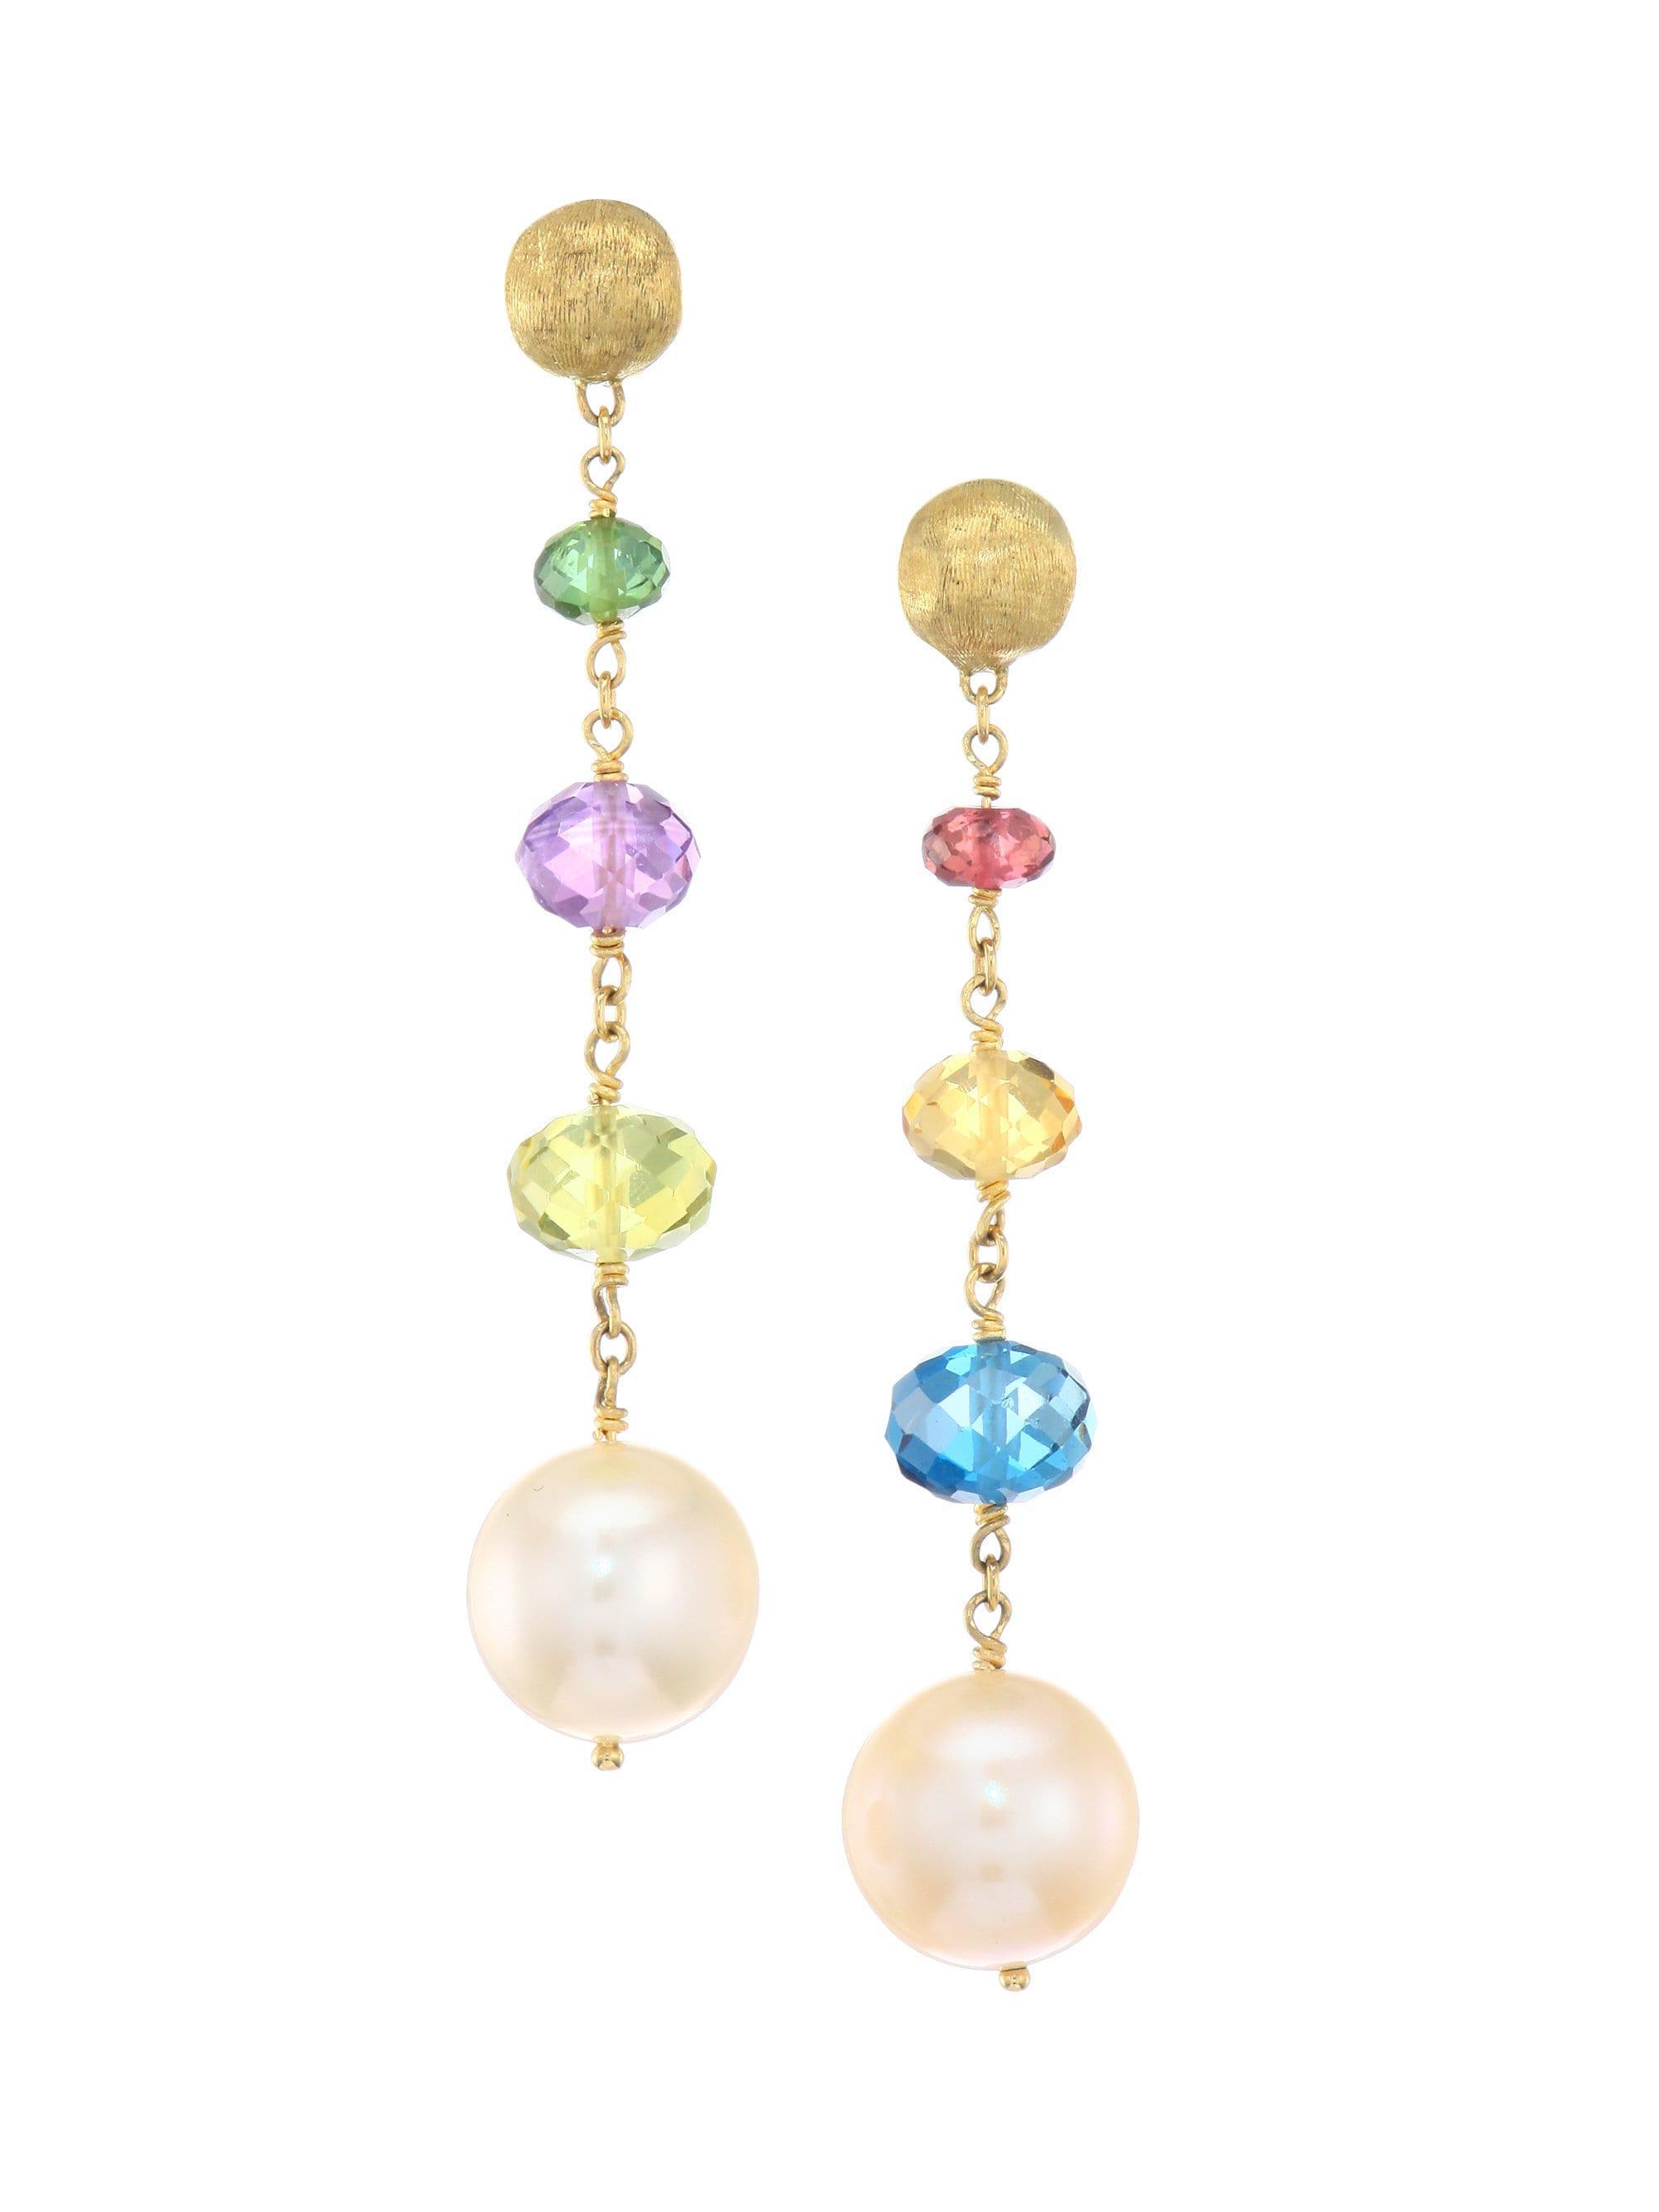 efc09b2b3d0 Women's Africa 18k Yellow Gold Mixed Gemstone & 11mm Pearl Drop Earrings